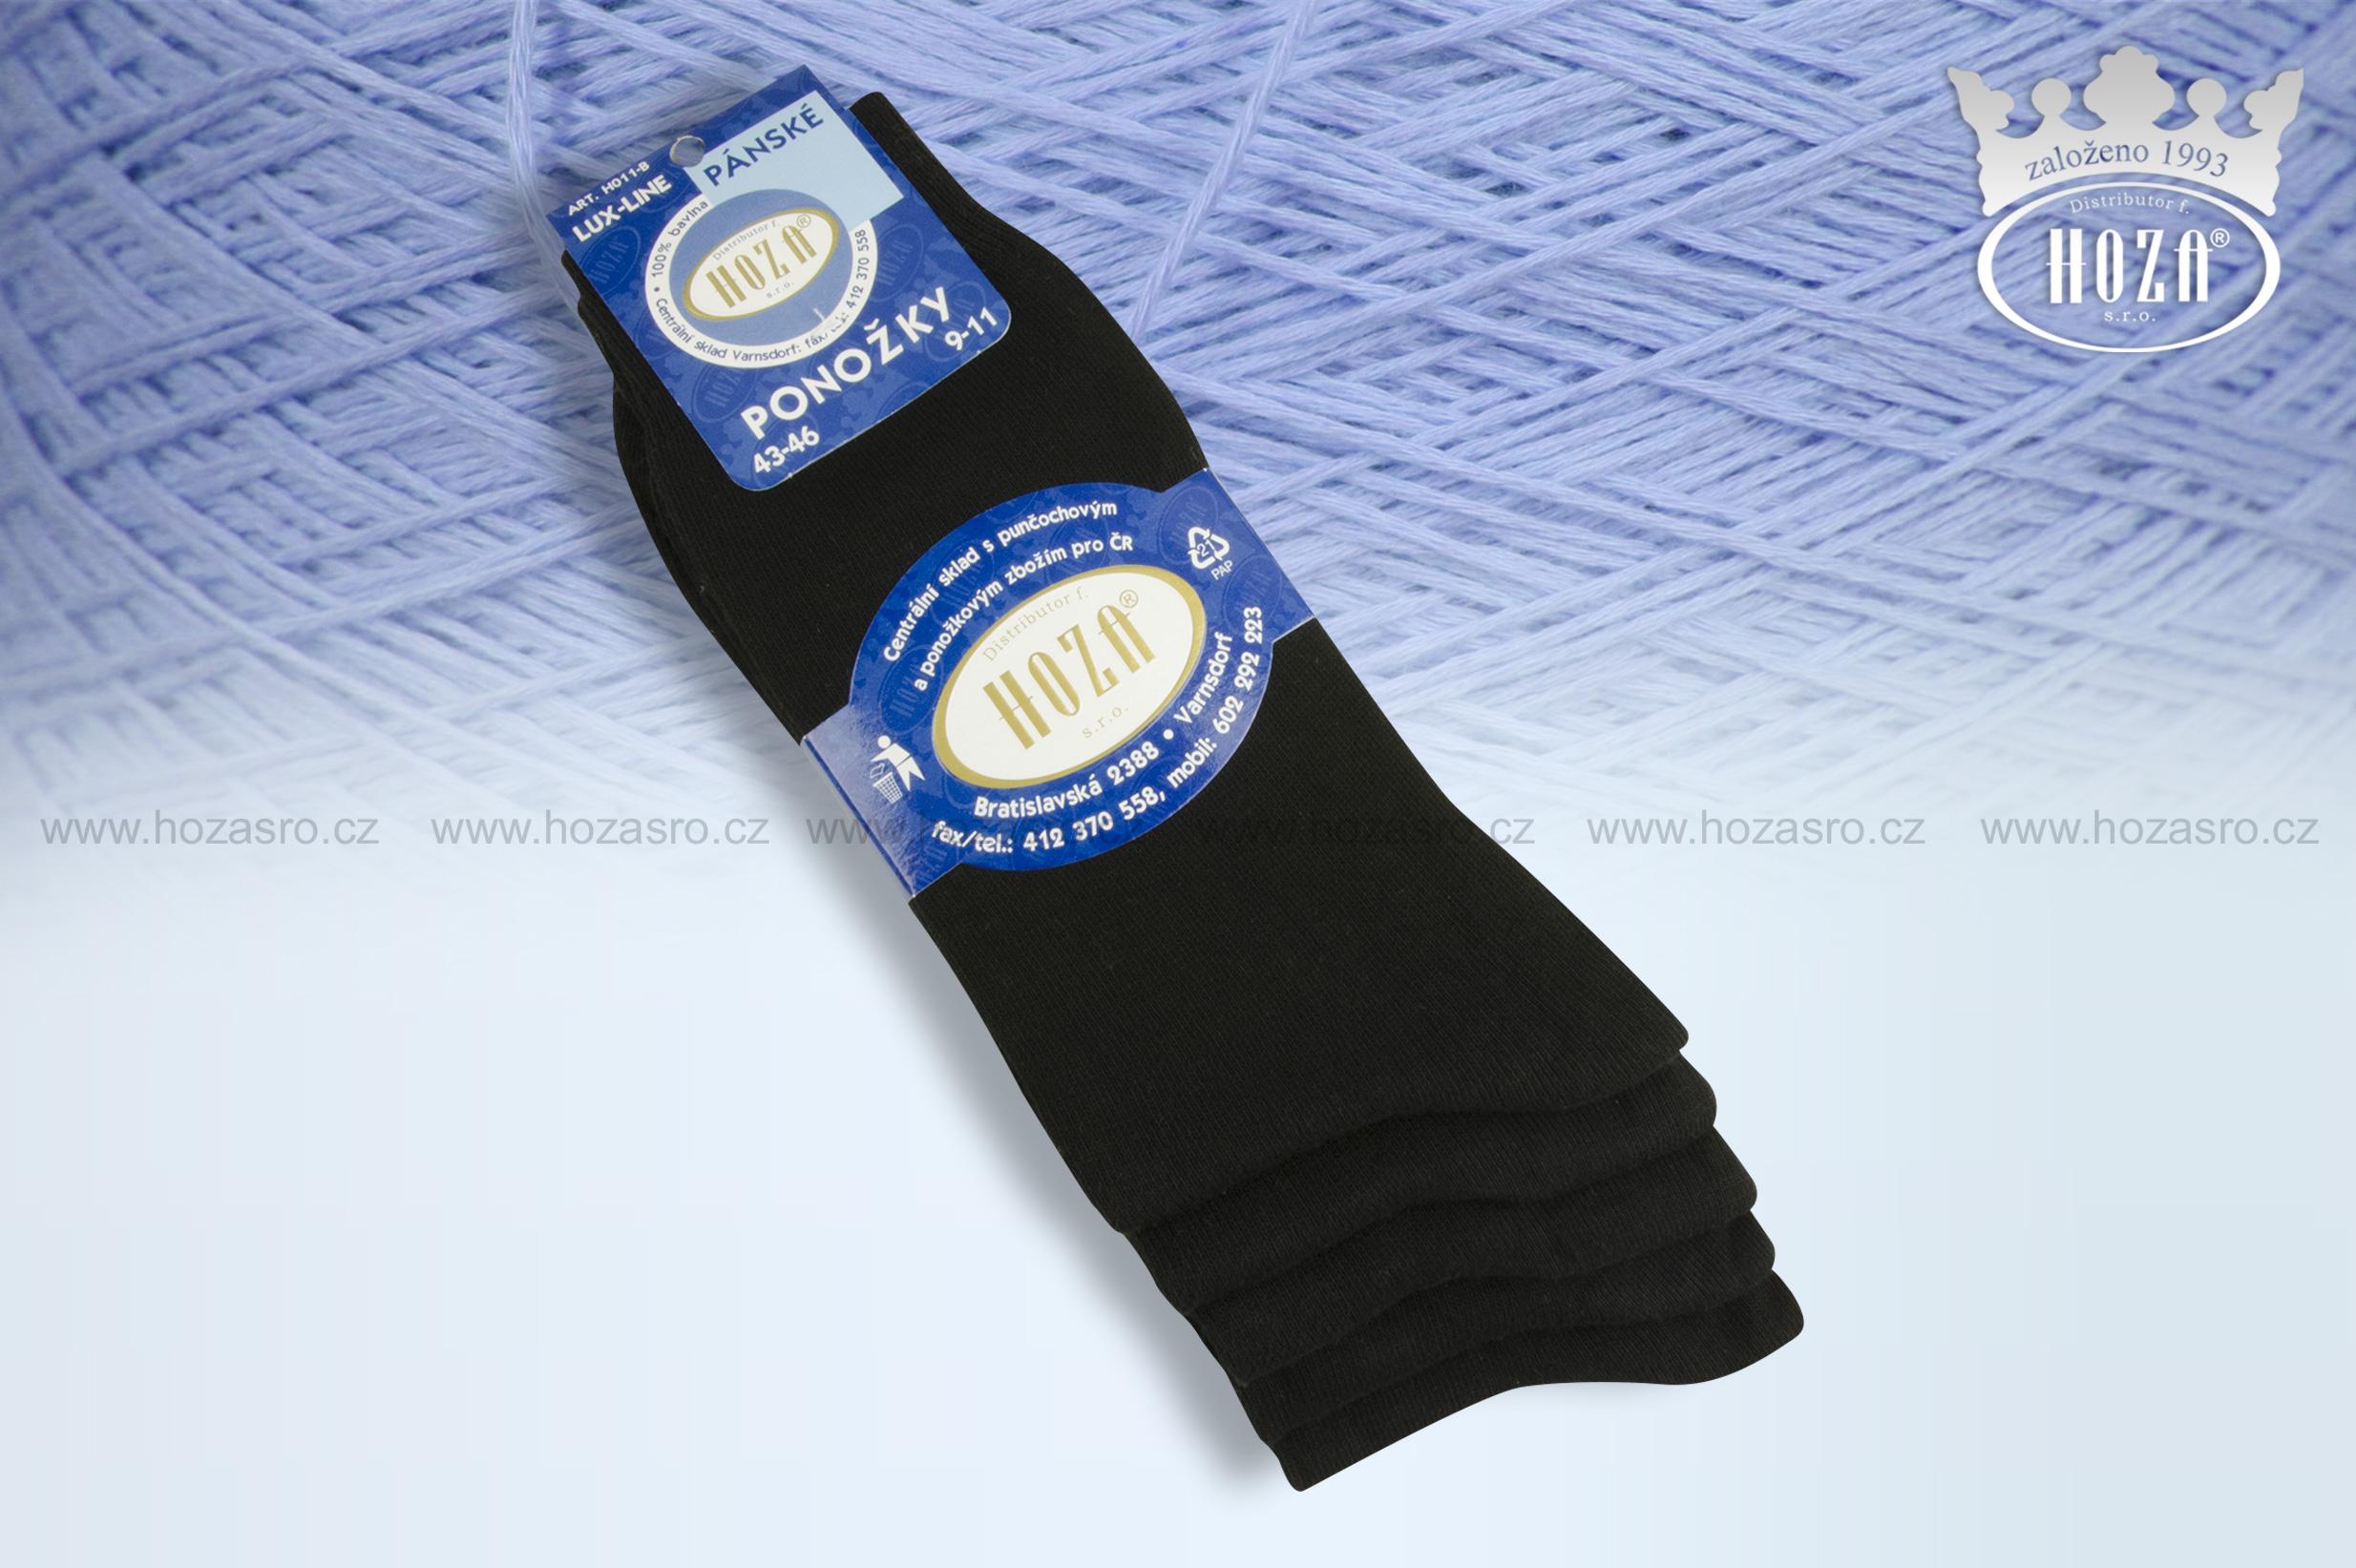 Pánské ponožky hladké, 100% bavlna - černé - H011-B